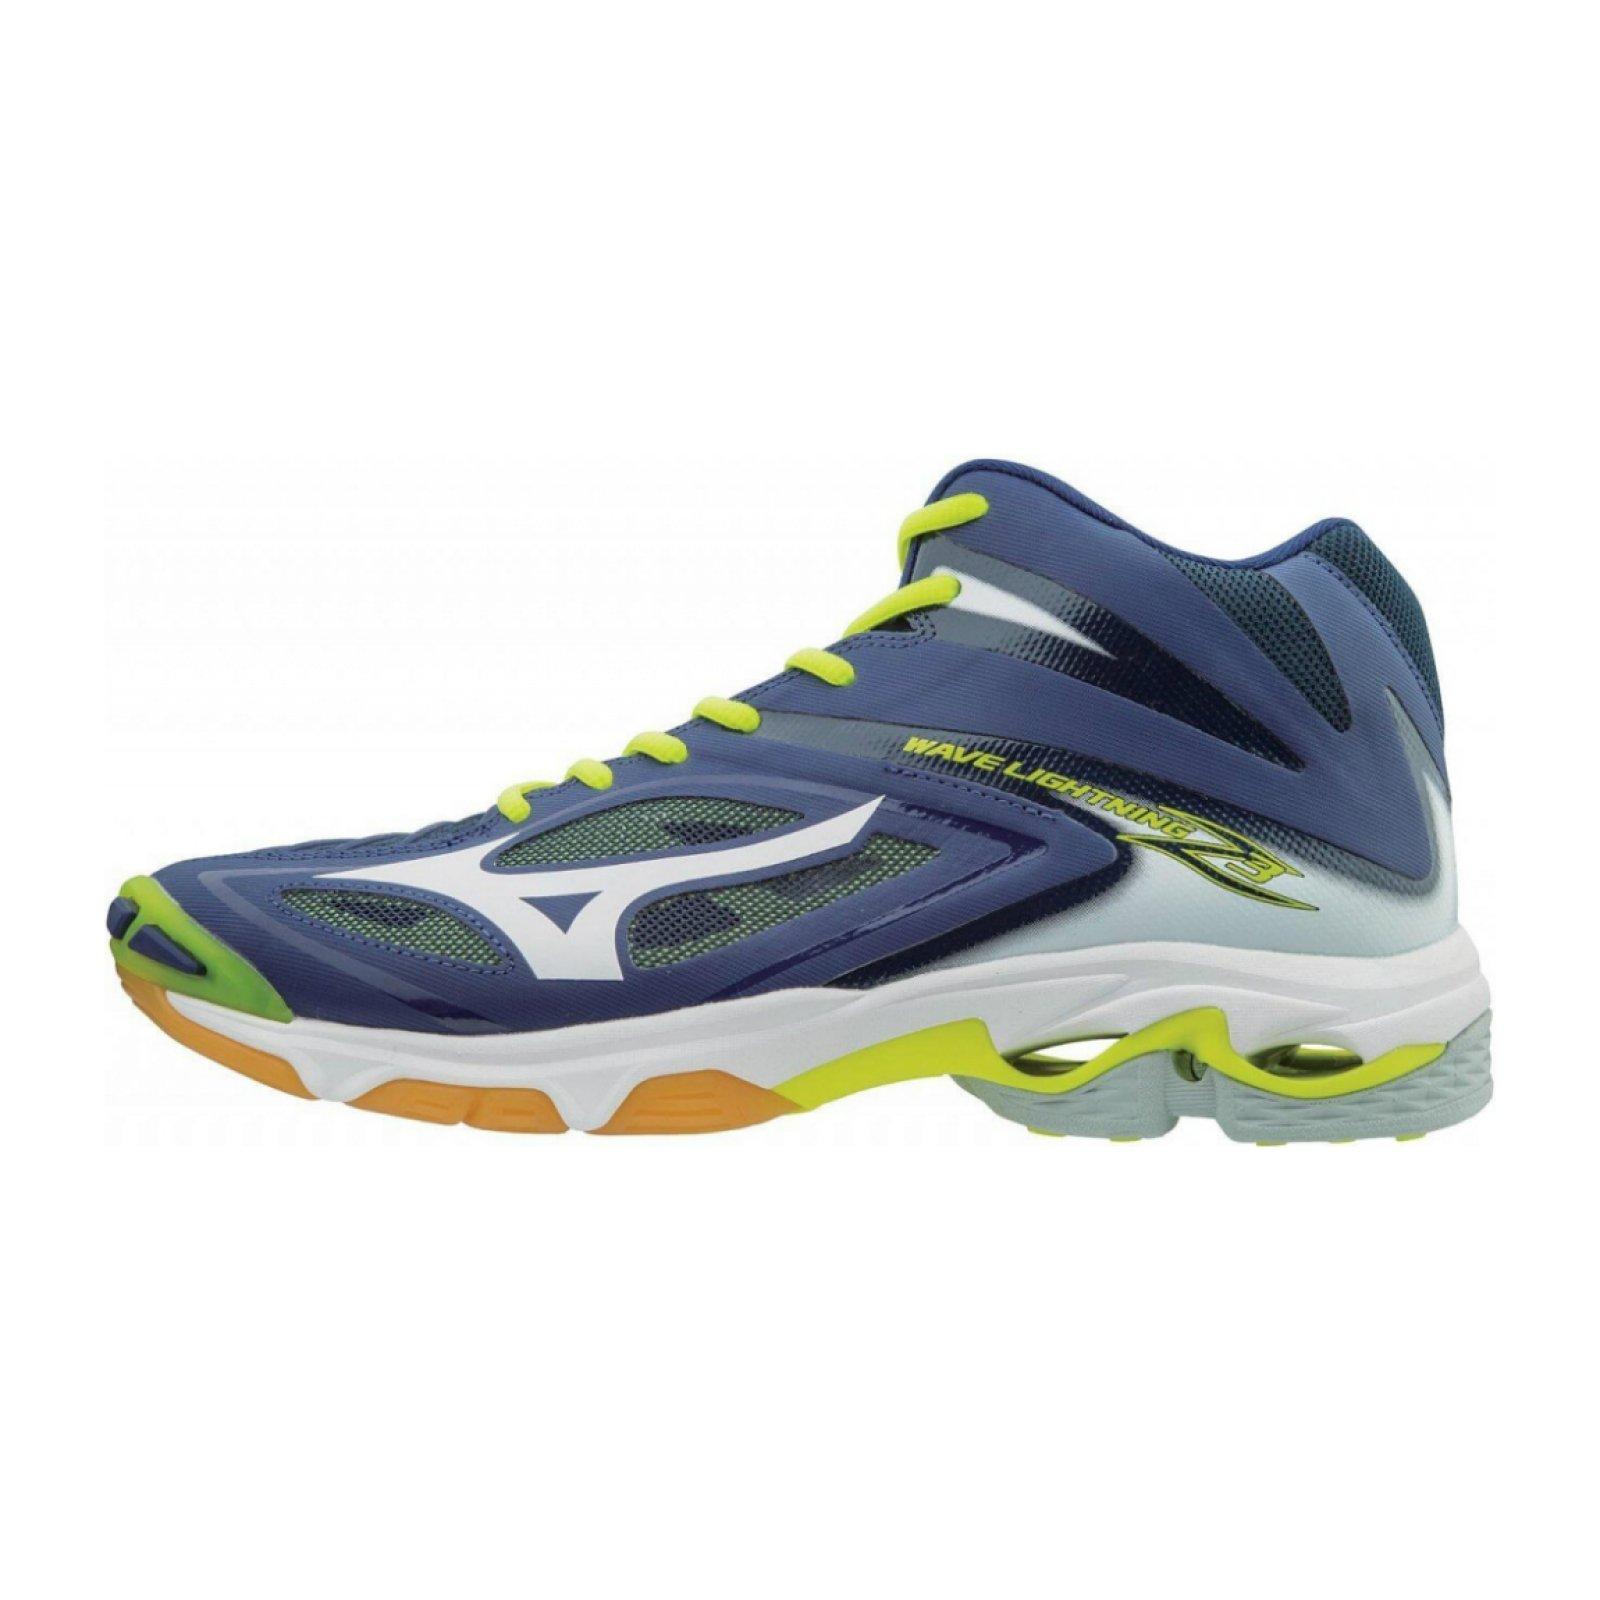 Volejbalové boty Mizuno Wave Lightning Z3 Mid U V1GA170571 ... c6bc7f9747